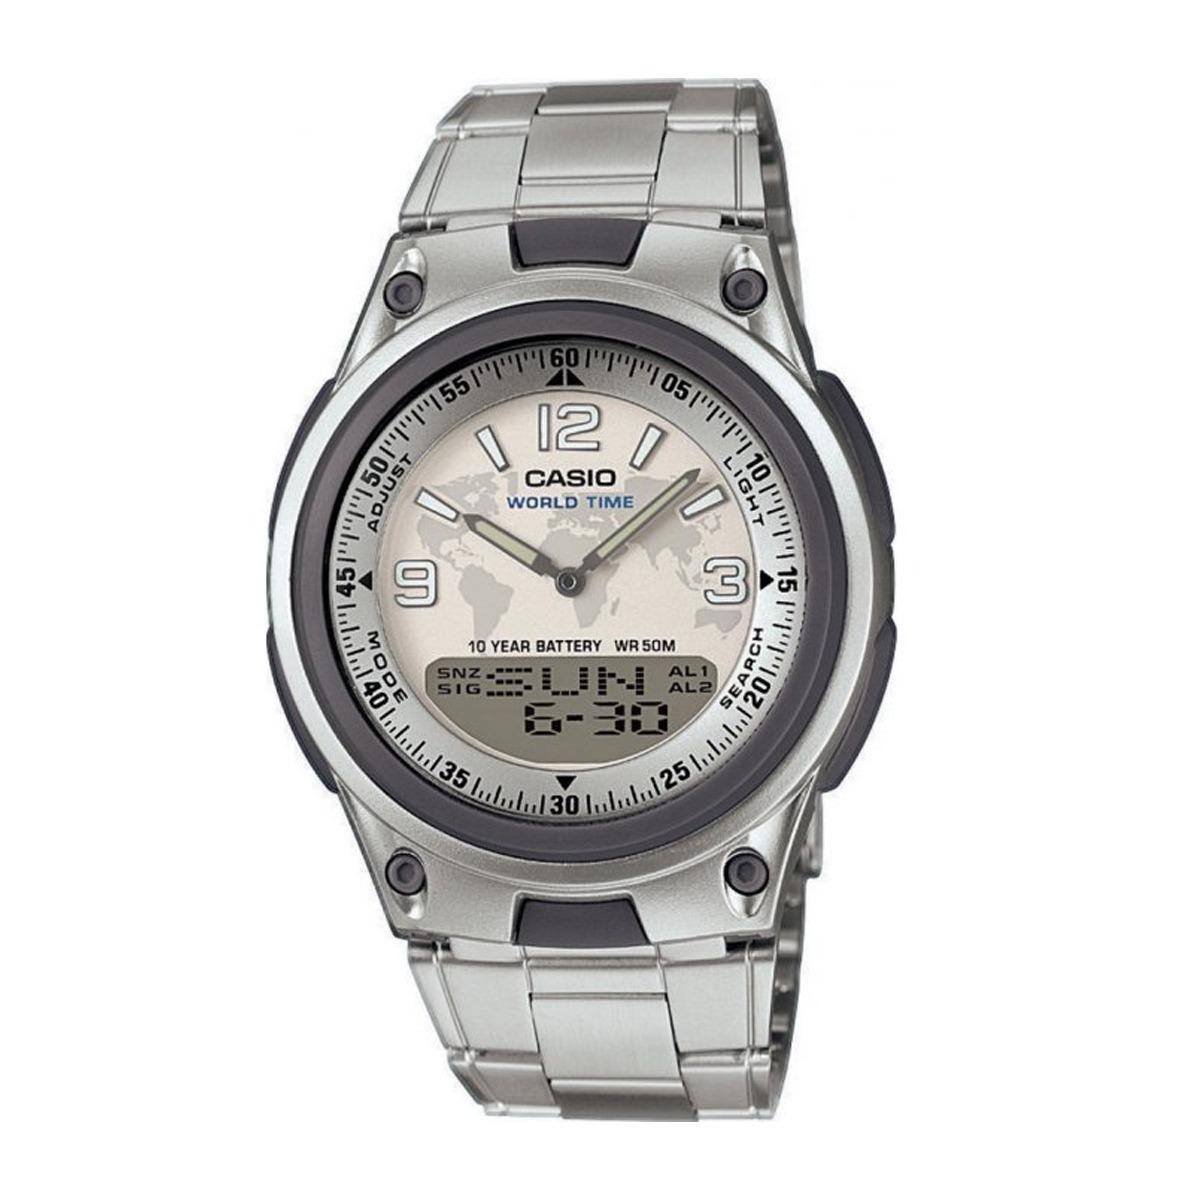 Megawatches 80d Casio Reloj Digital Wr Hombre Aw Analógico 53RcAjLqS4